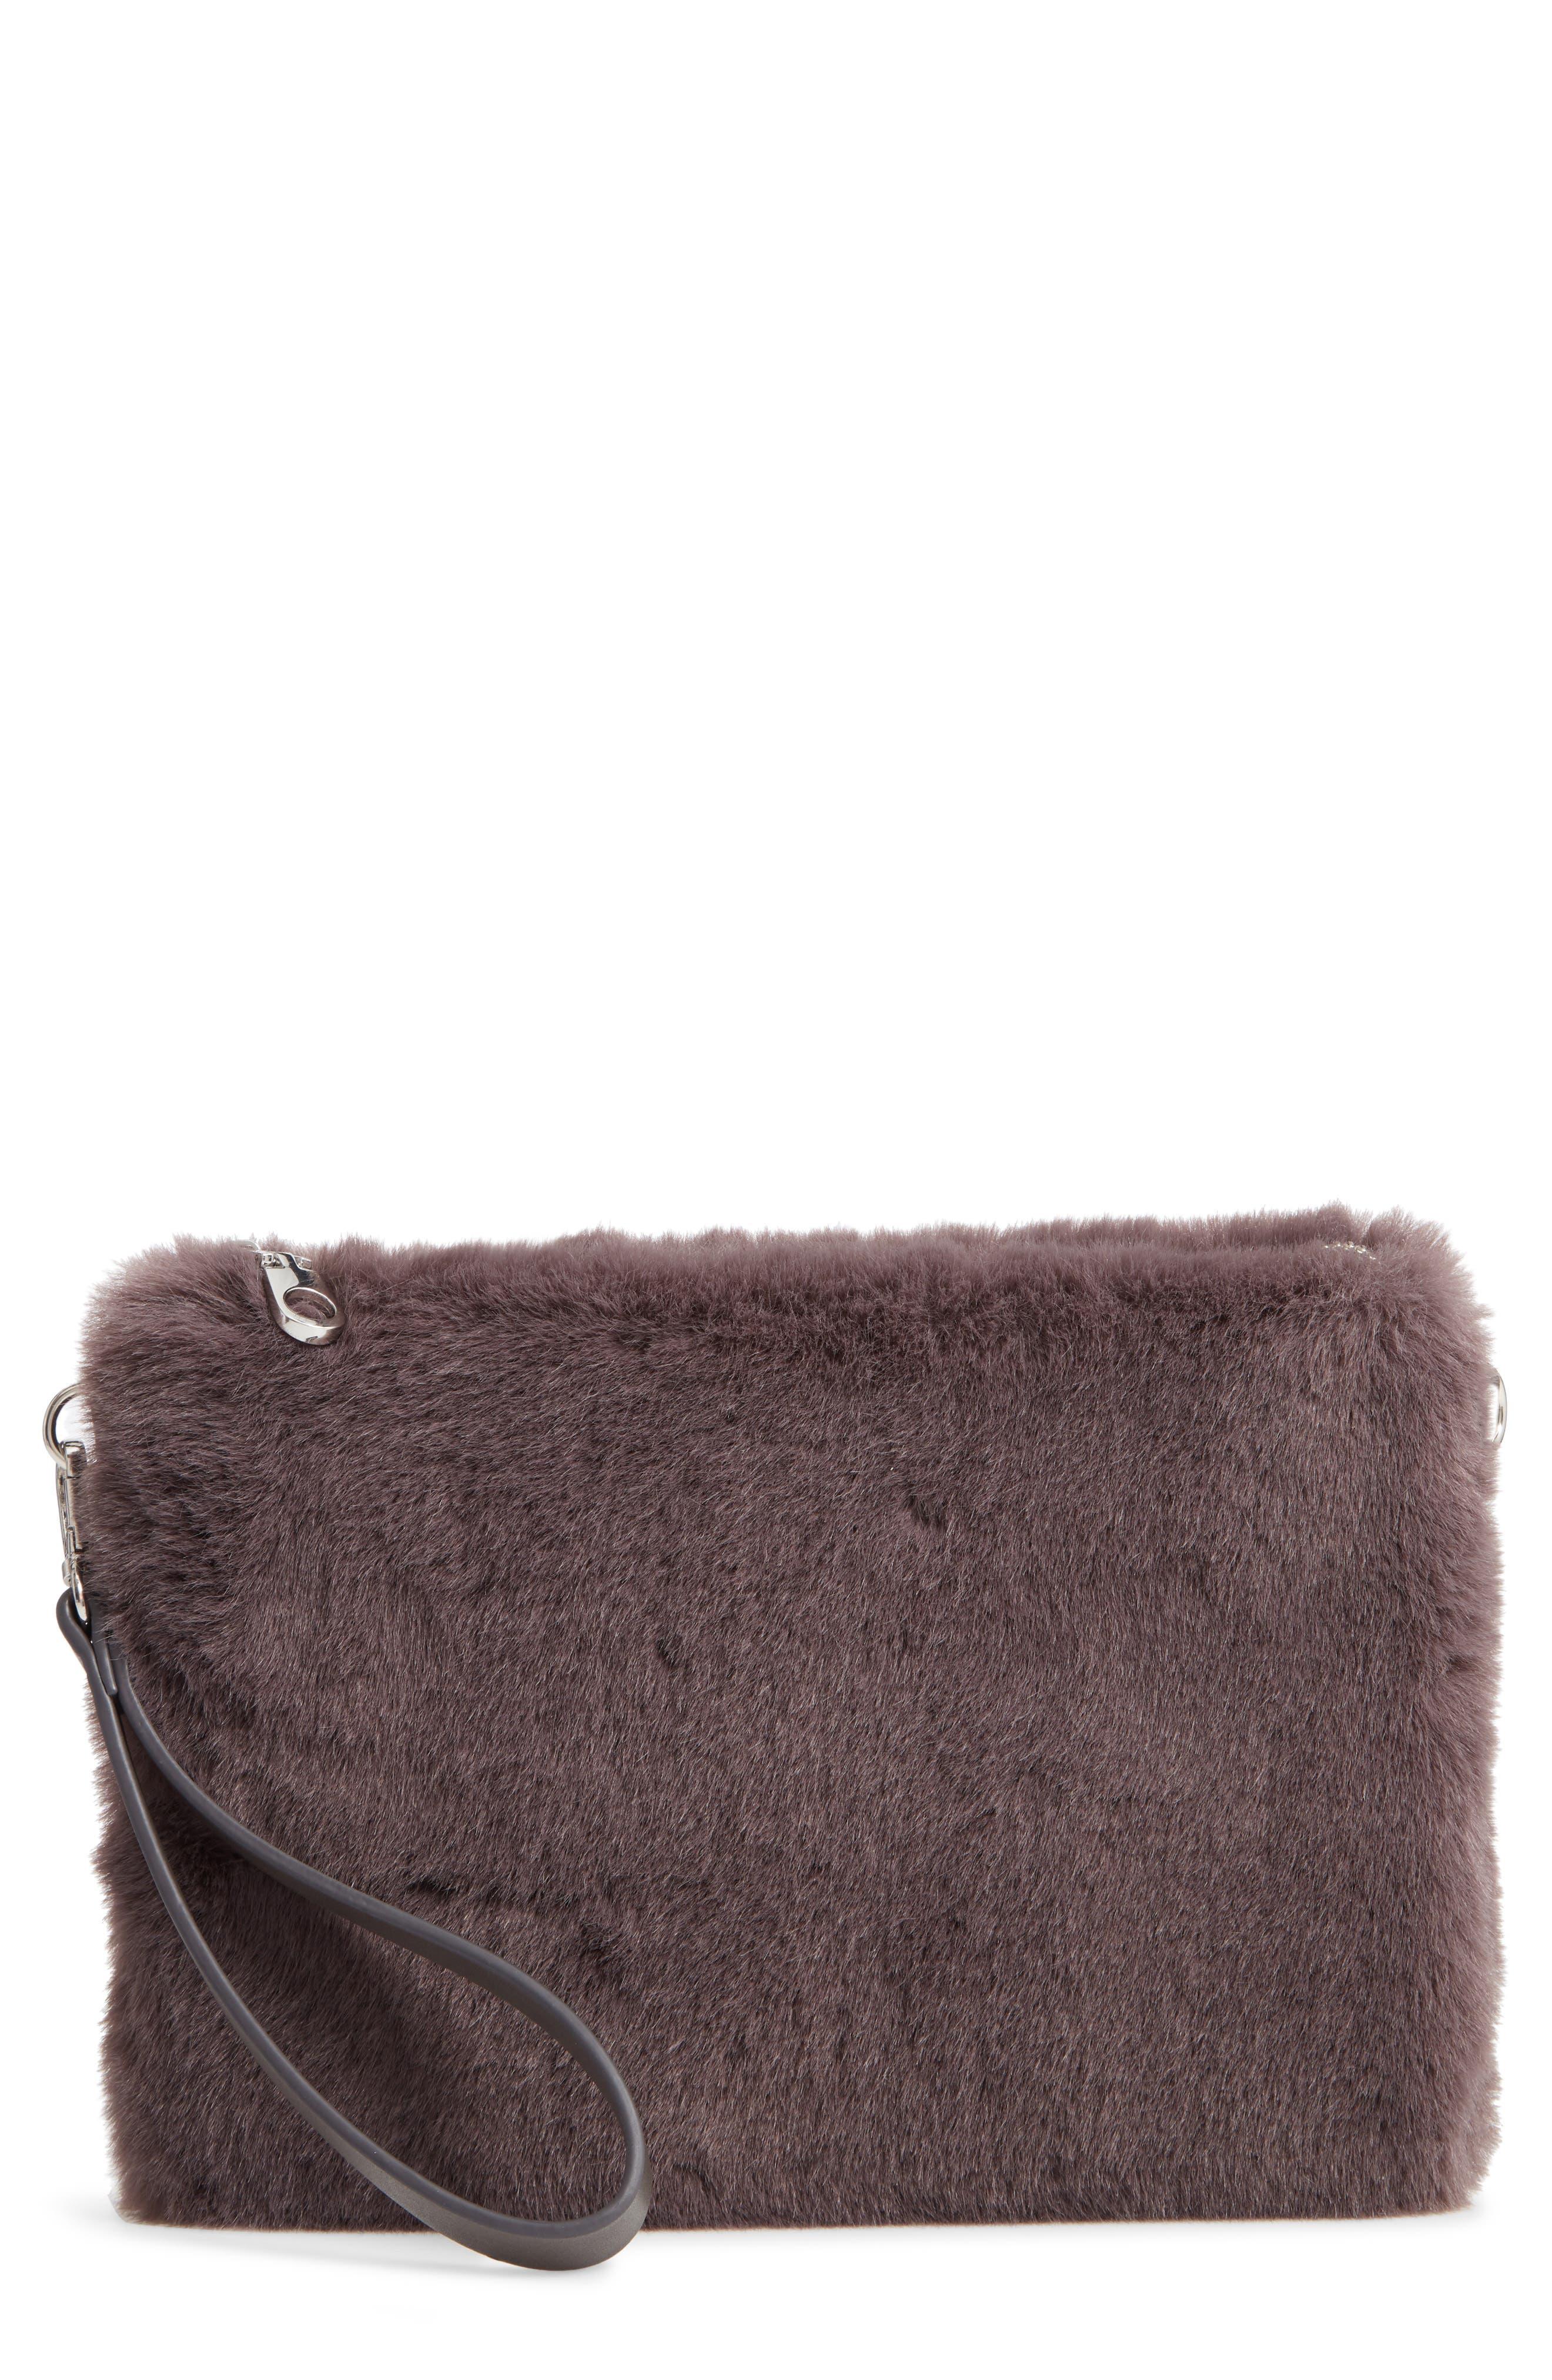 Astley Faux Fur Convertible Clutch,                             Main thumbnail 1, color,                             GREY CASTLEROCK